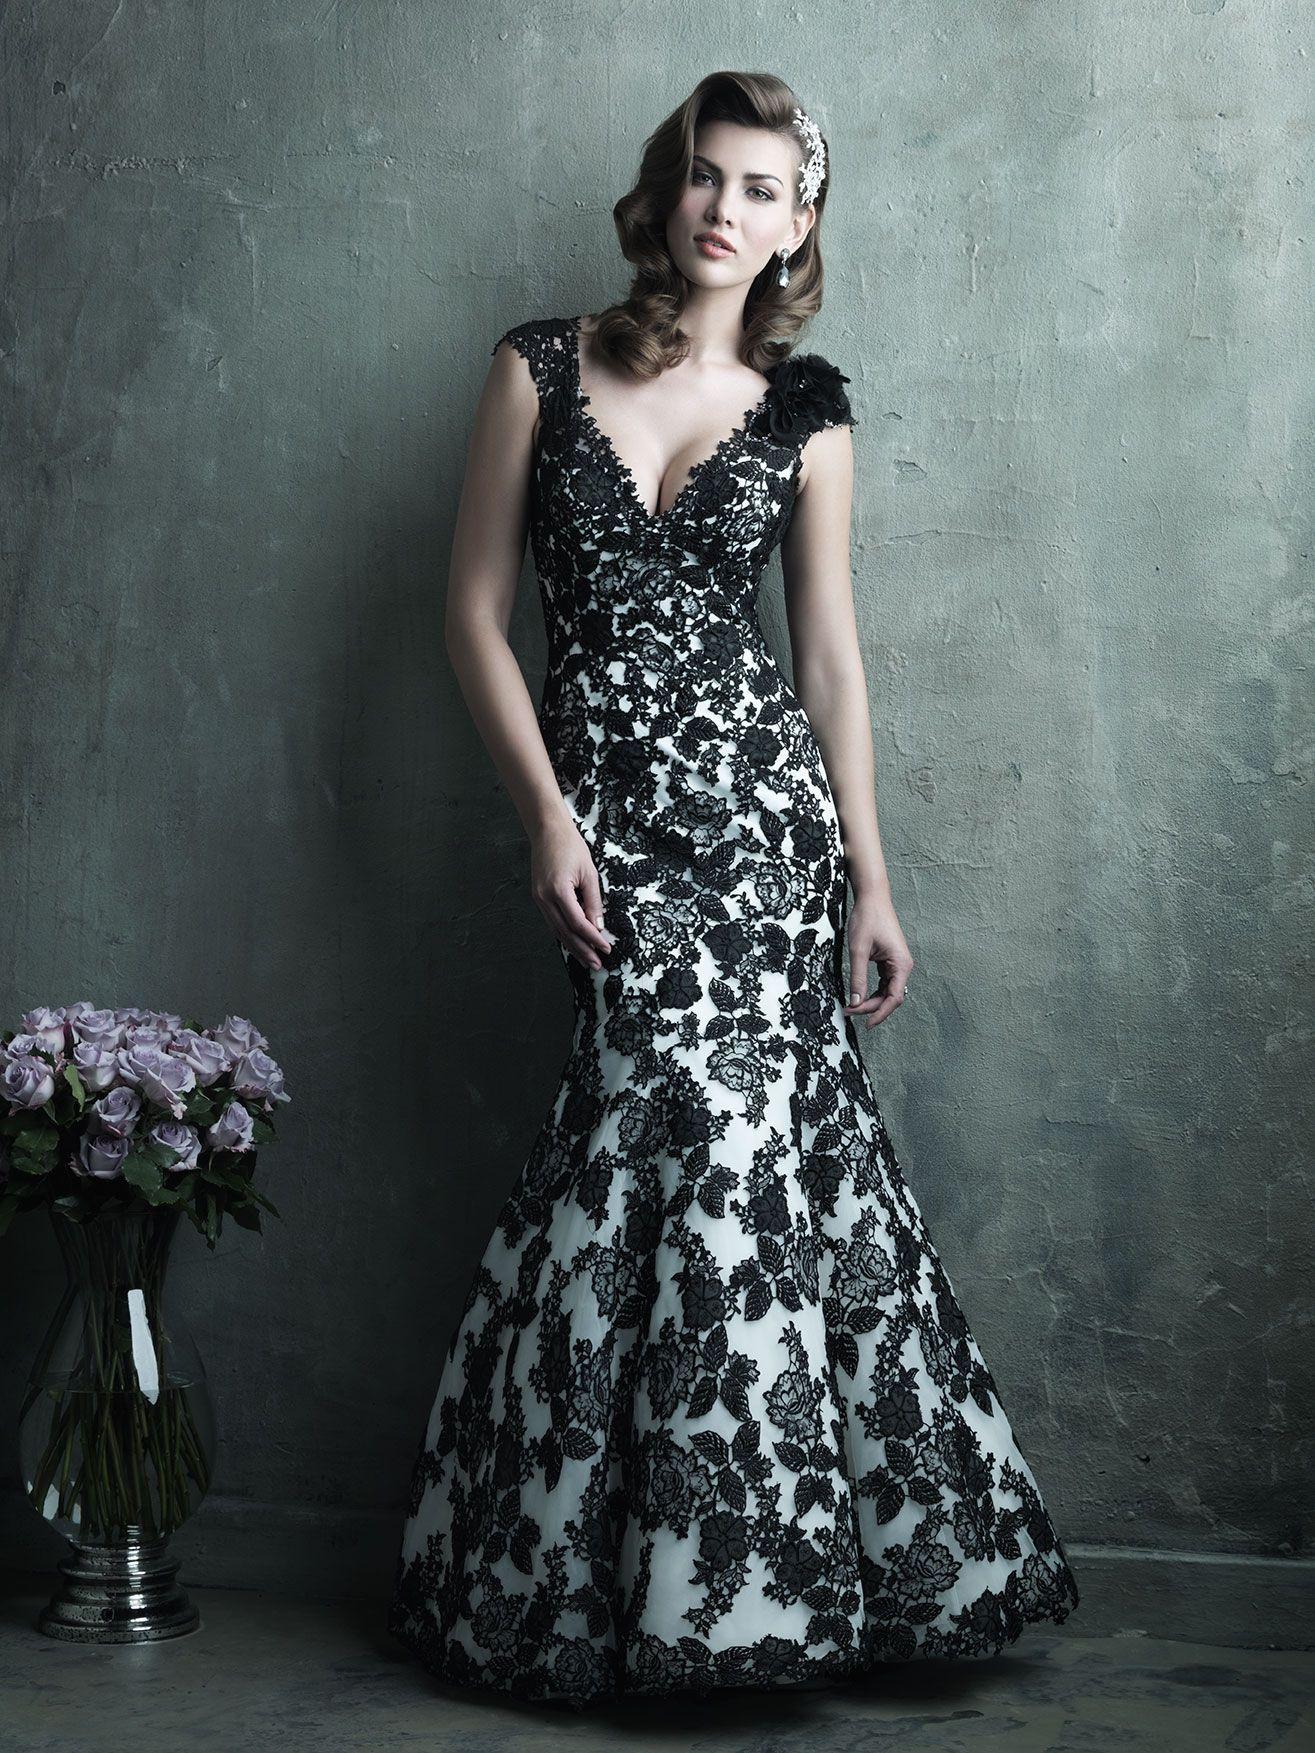 Allure Bridals Black White Organza Lace Applique Trumpet Gown